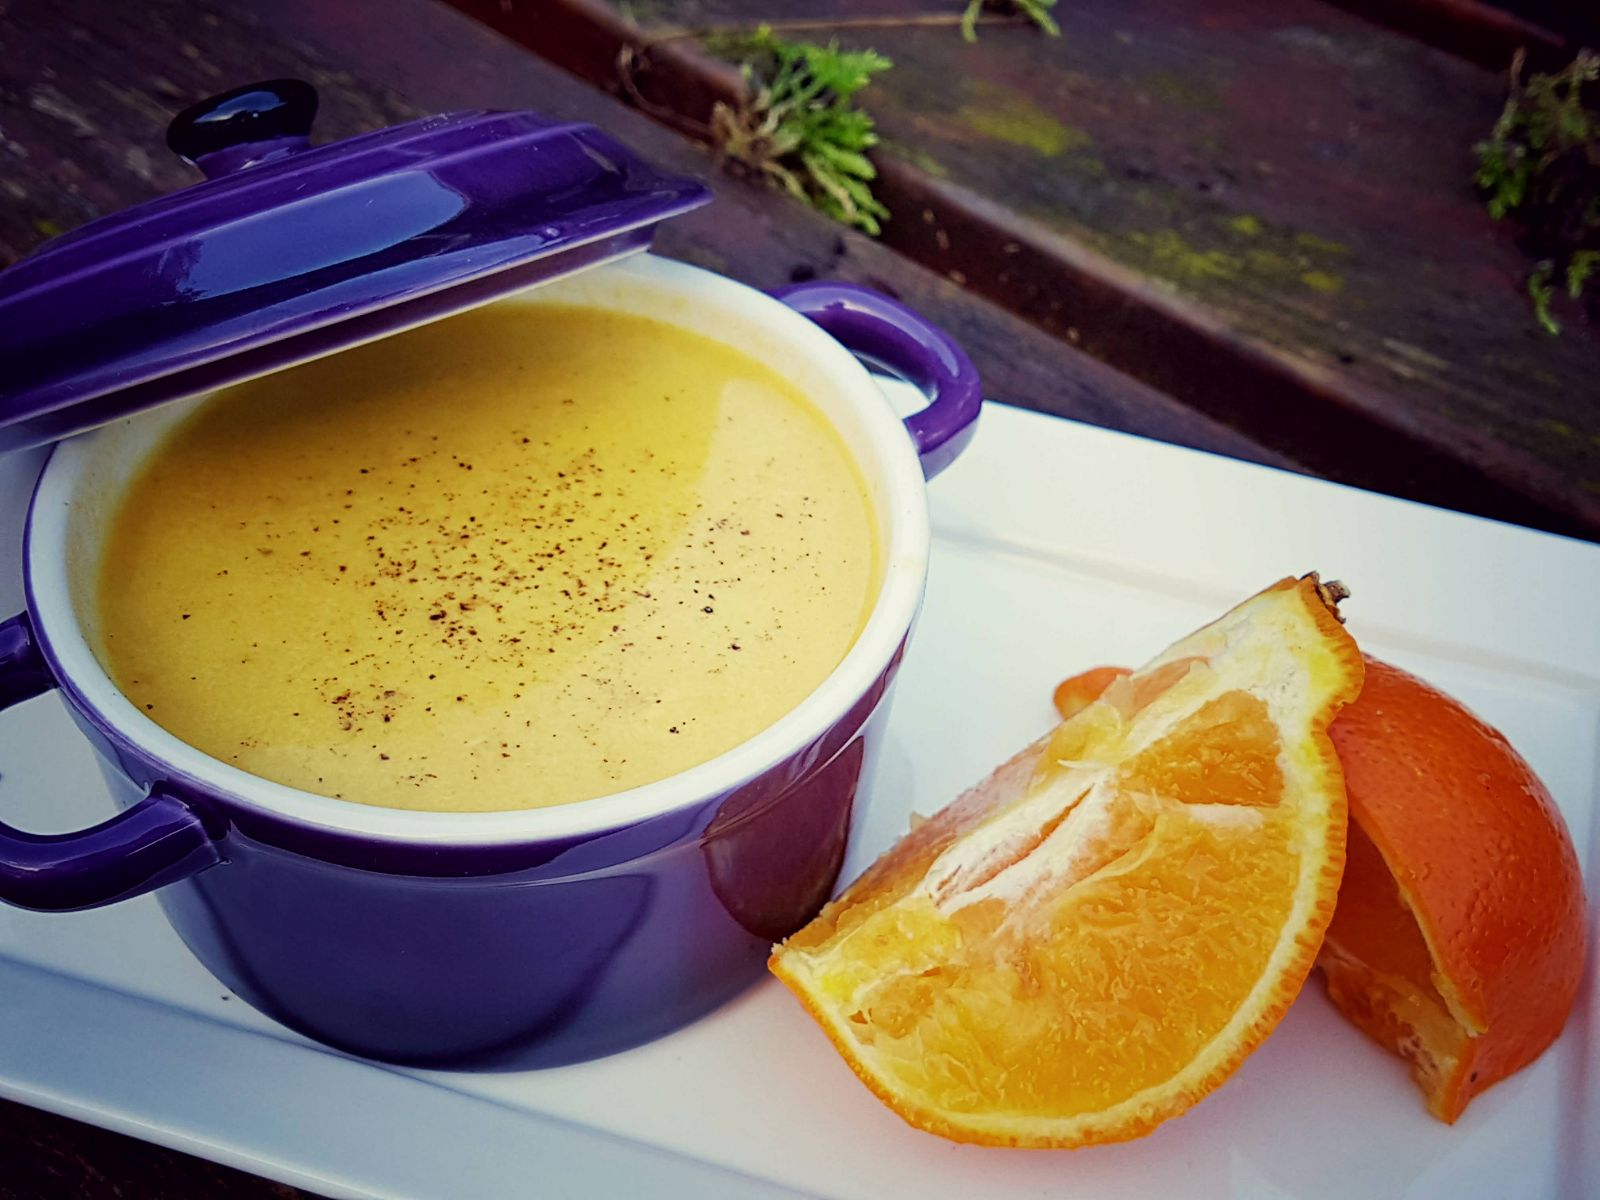 vegan wortelsoep met een vleugje sinaasappel - vegan soep